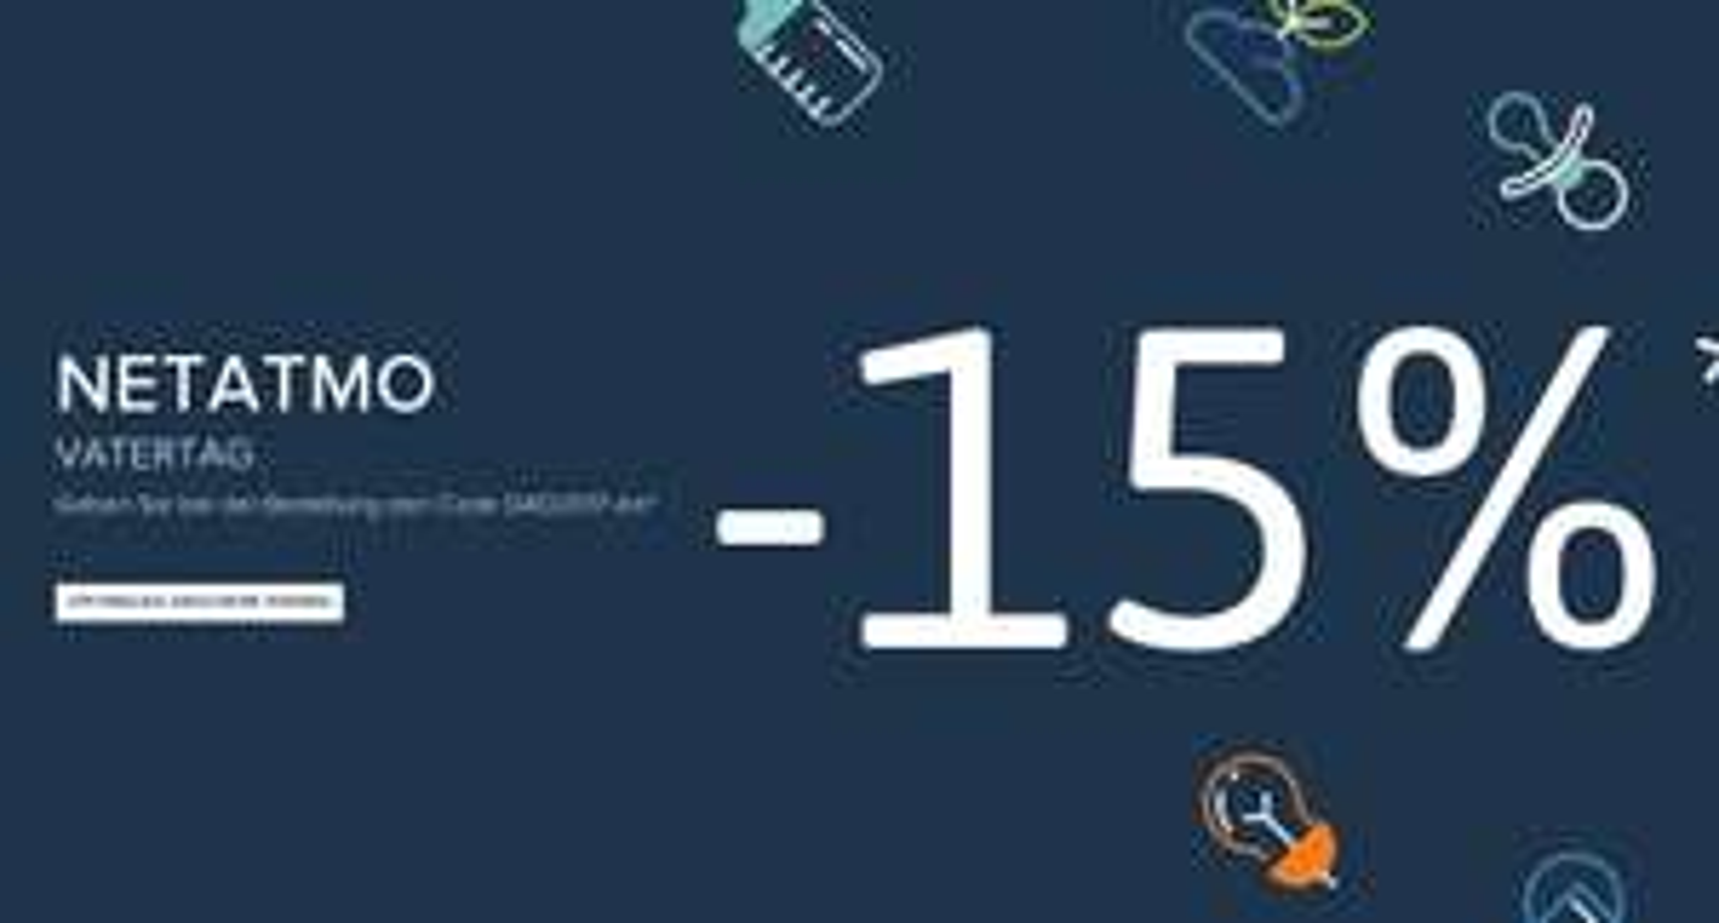 Netatmo Webshop Direktrabatt zum Vatertag 15% sparen